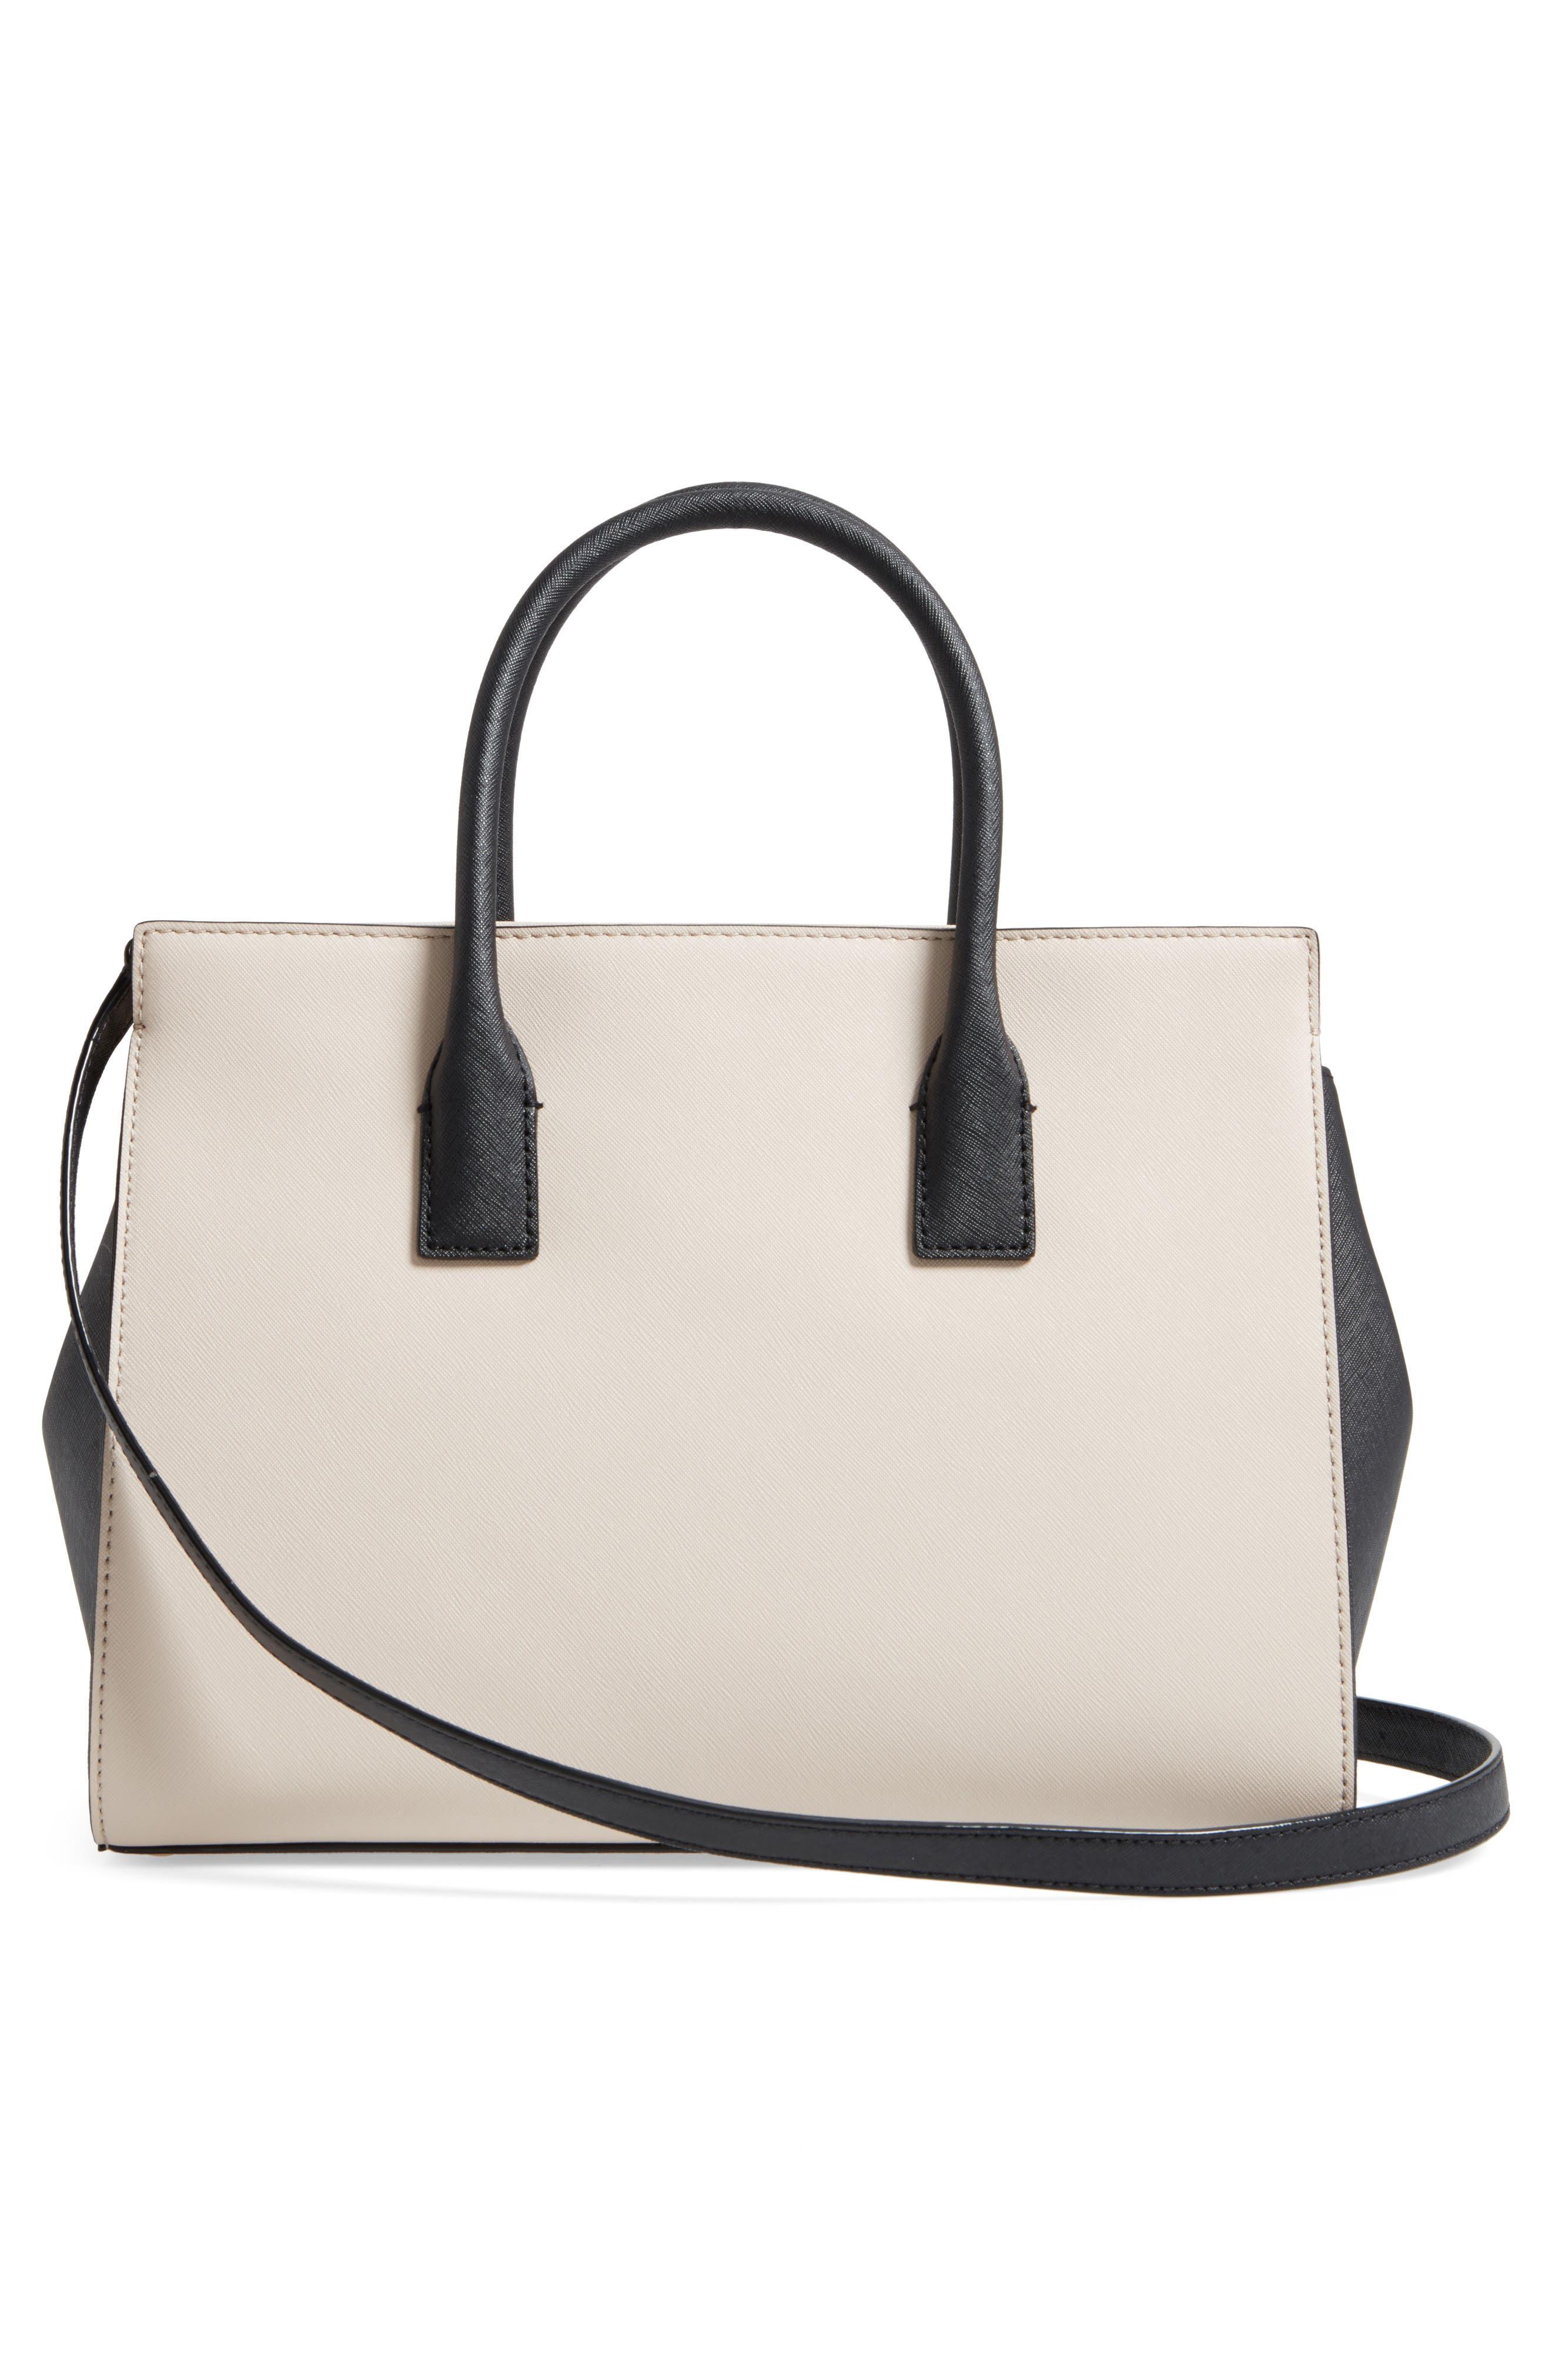 cameron street - candace leather satchel,                             Alternate thumbnail 3, color,                             Tusk/ Black